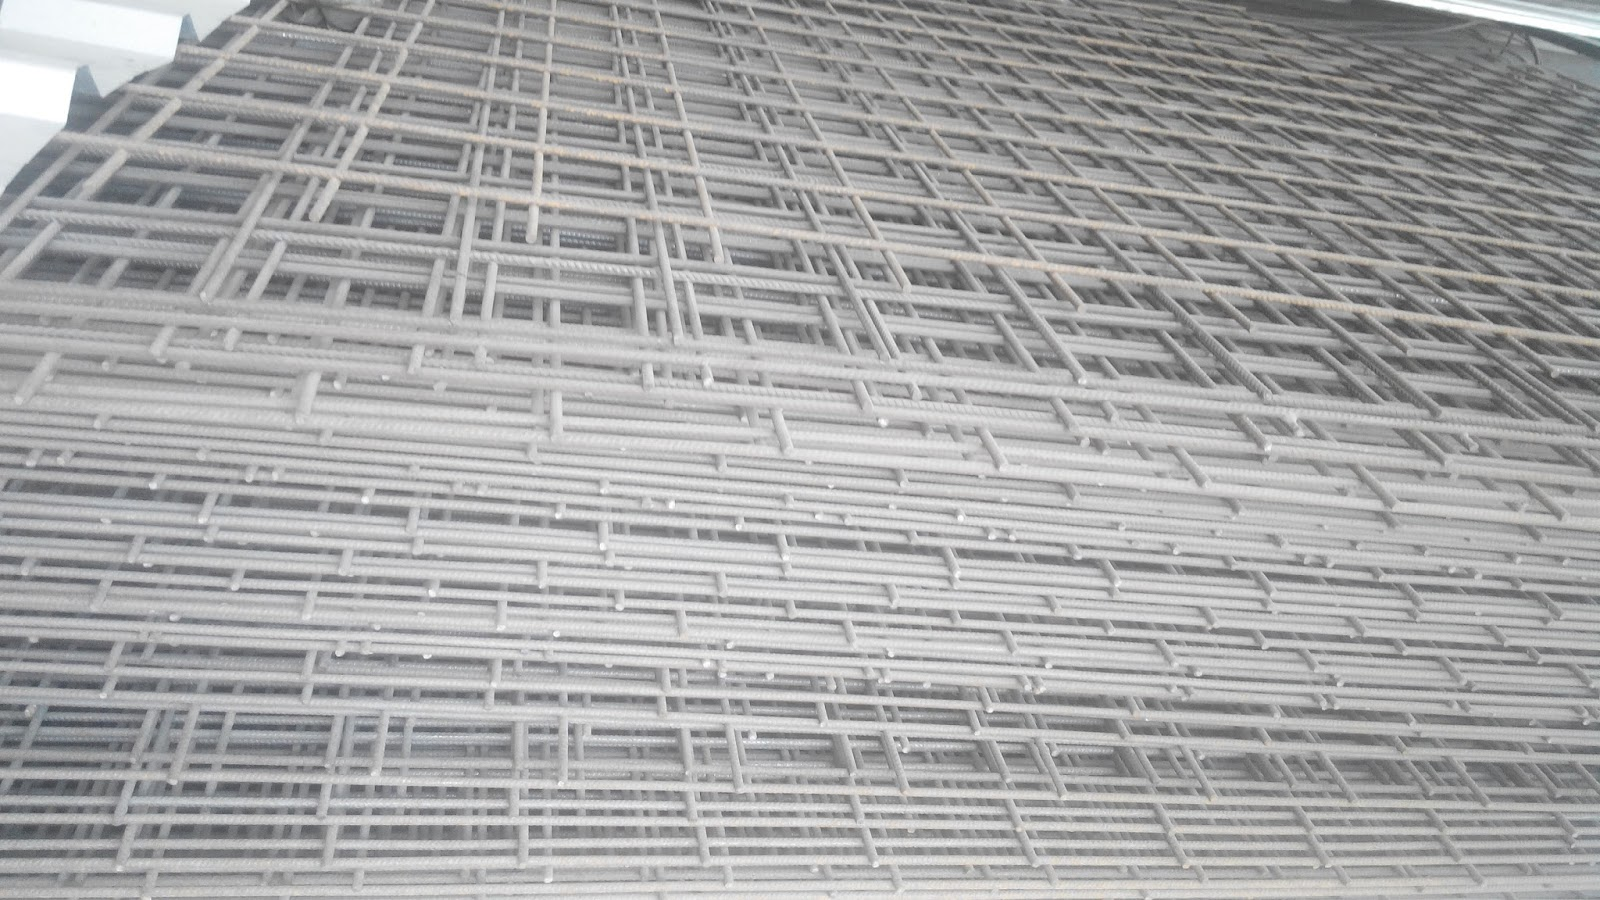 Dorable Distributor Wire Mesh Image Collection - Wiring Schematics ...